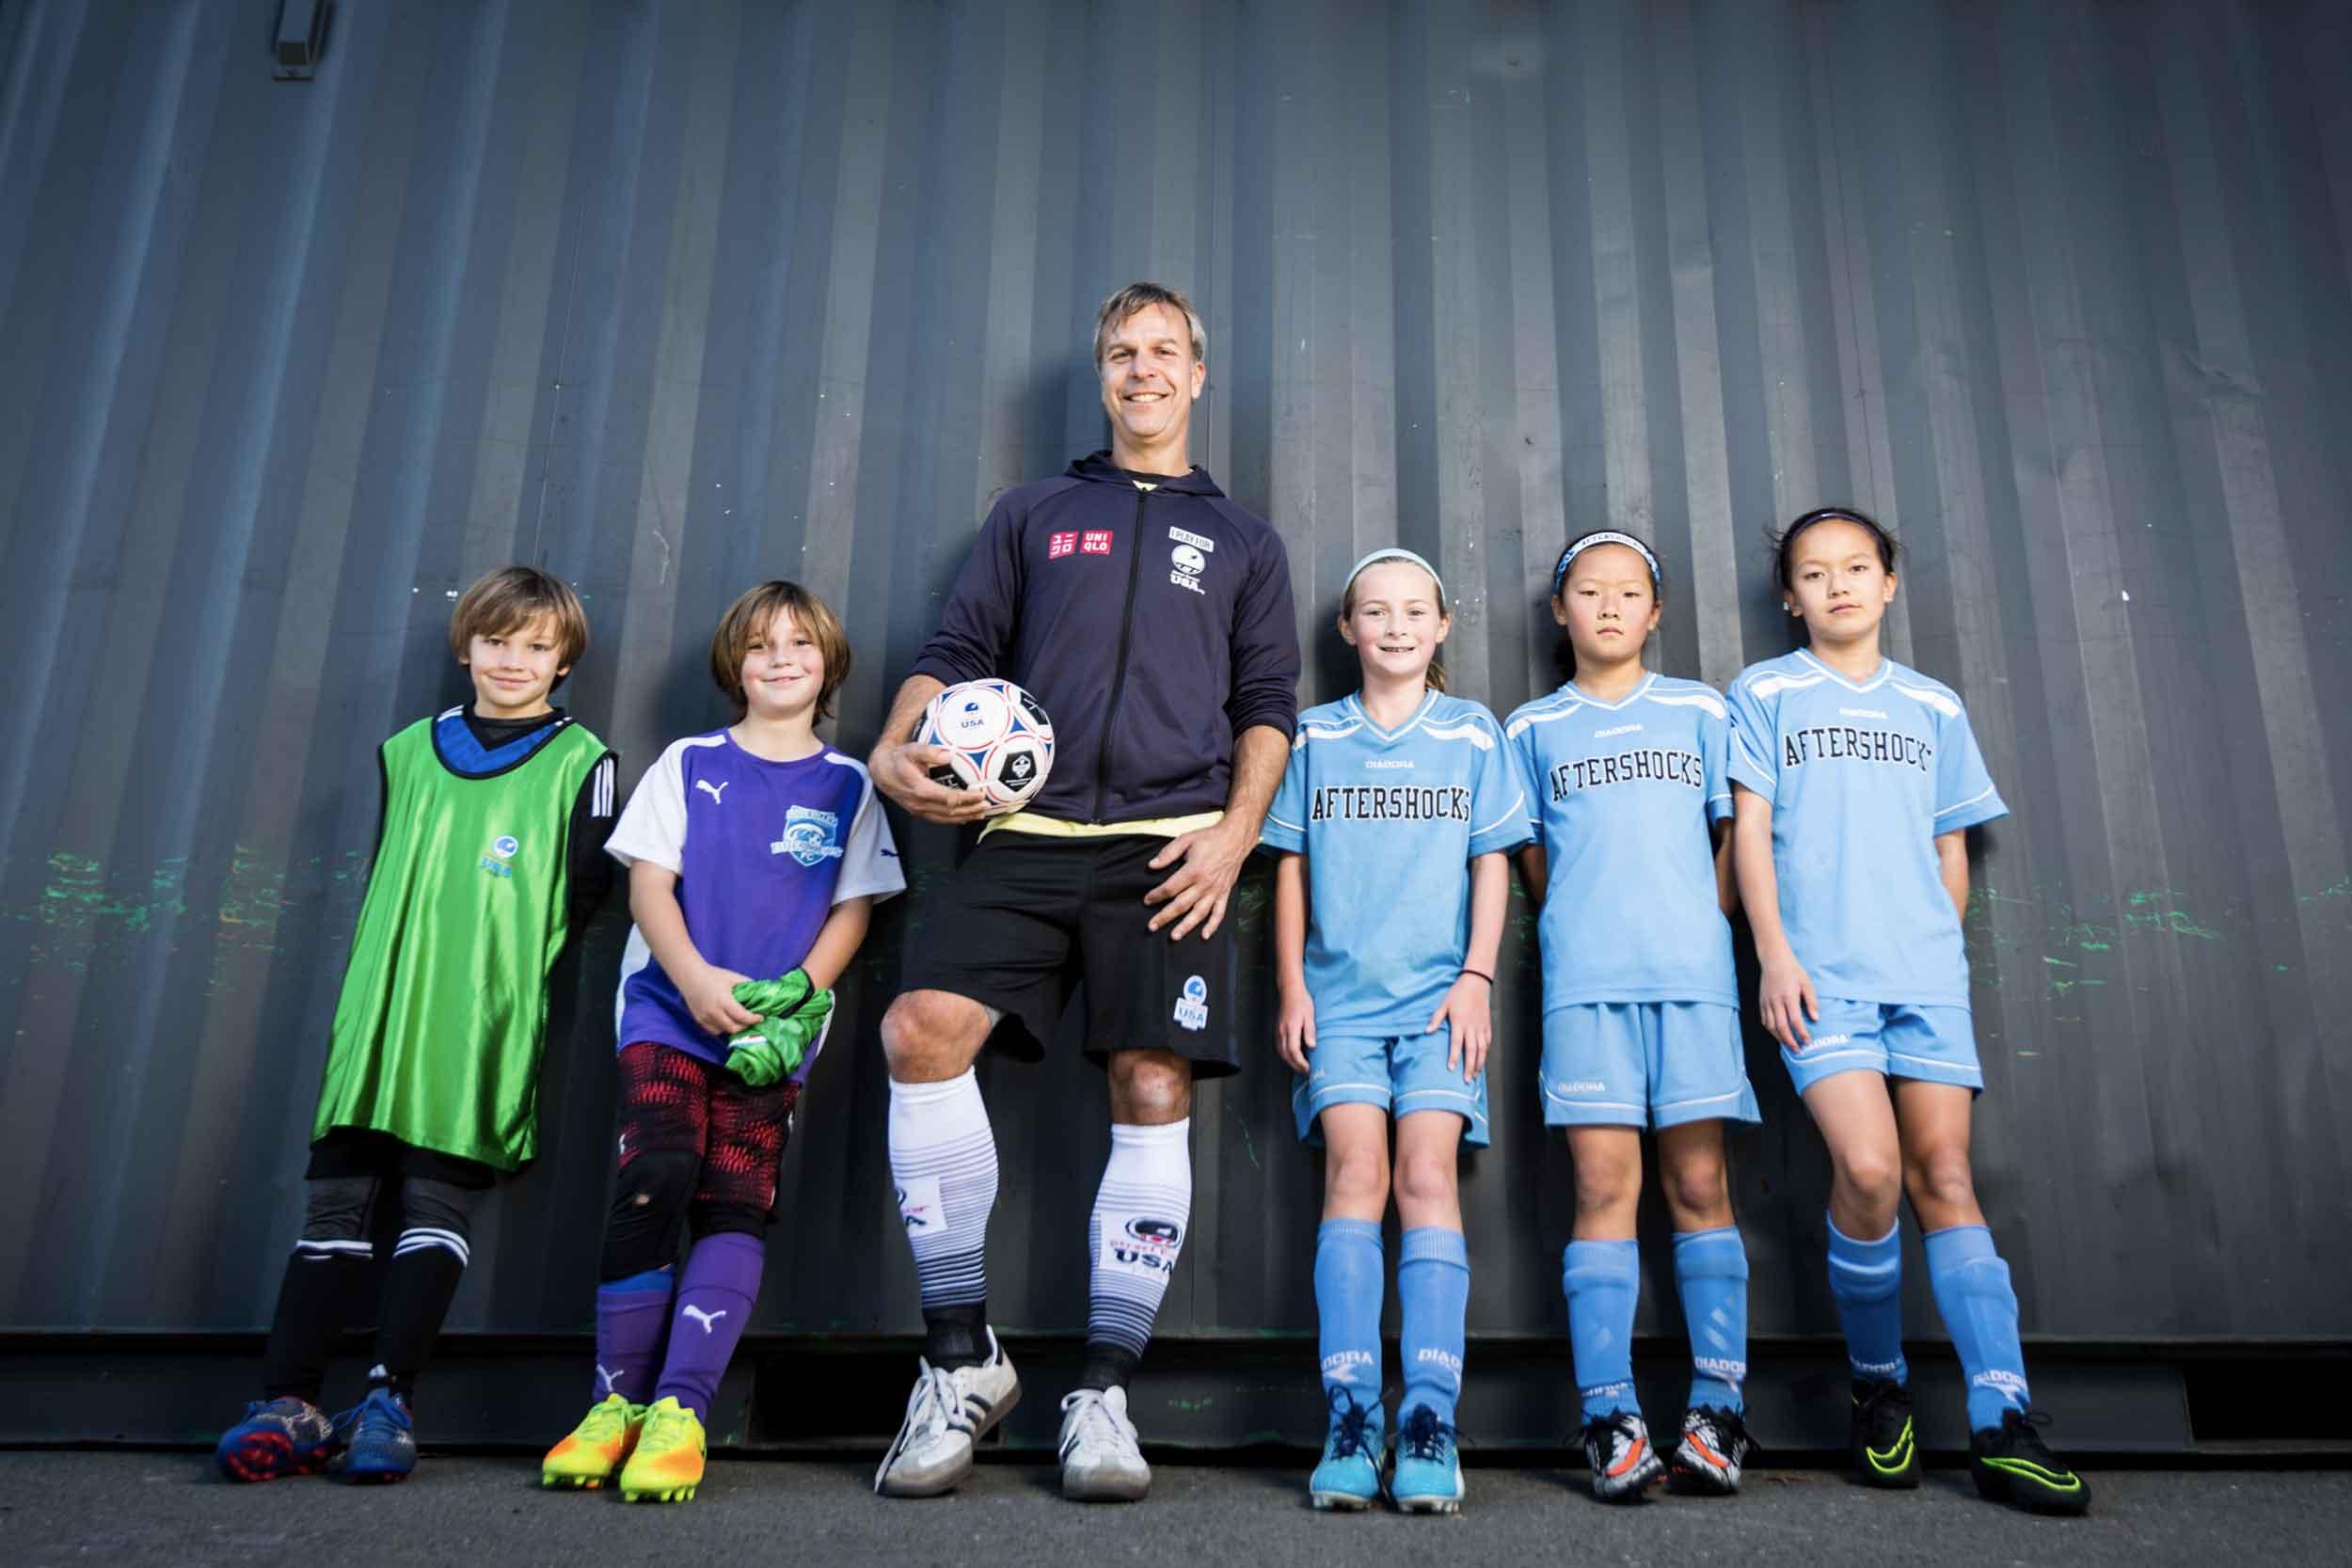 Urban Soccer Park found, Josh Frazier, with kid soccer players.